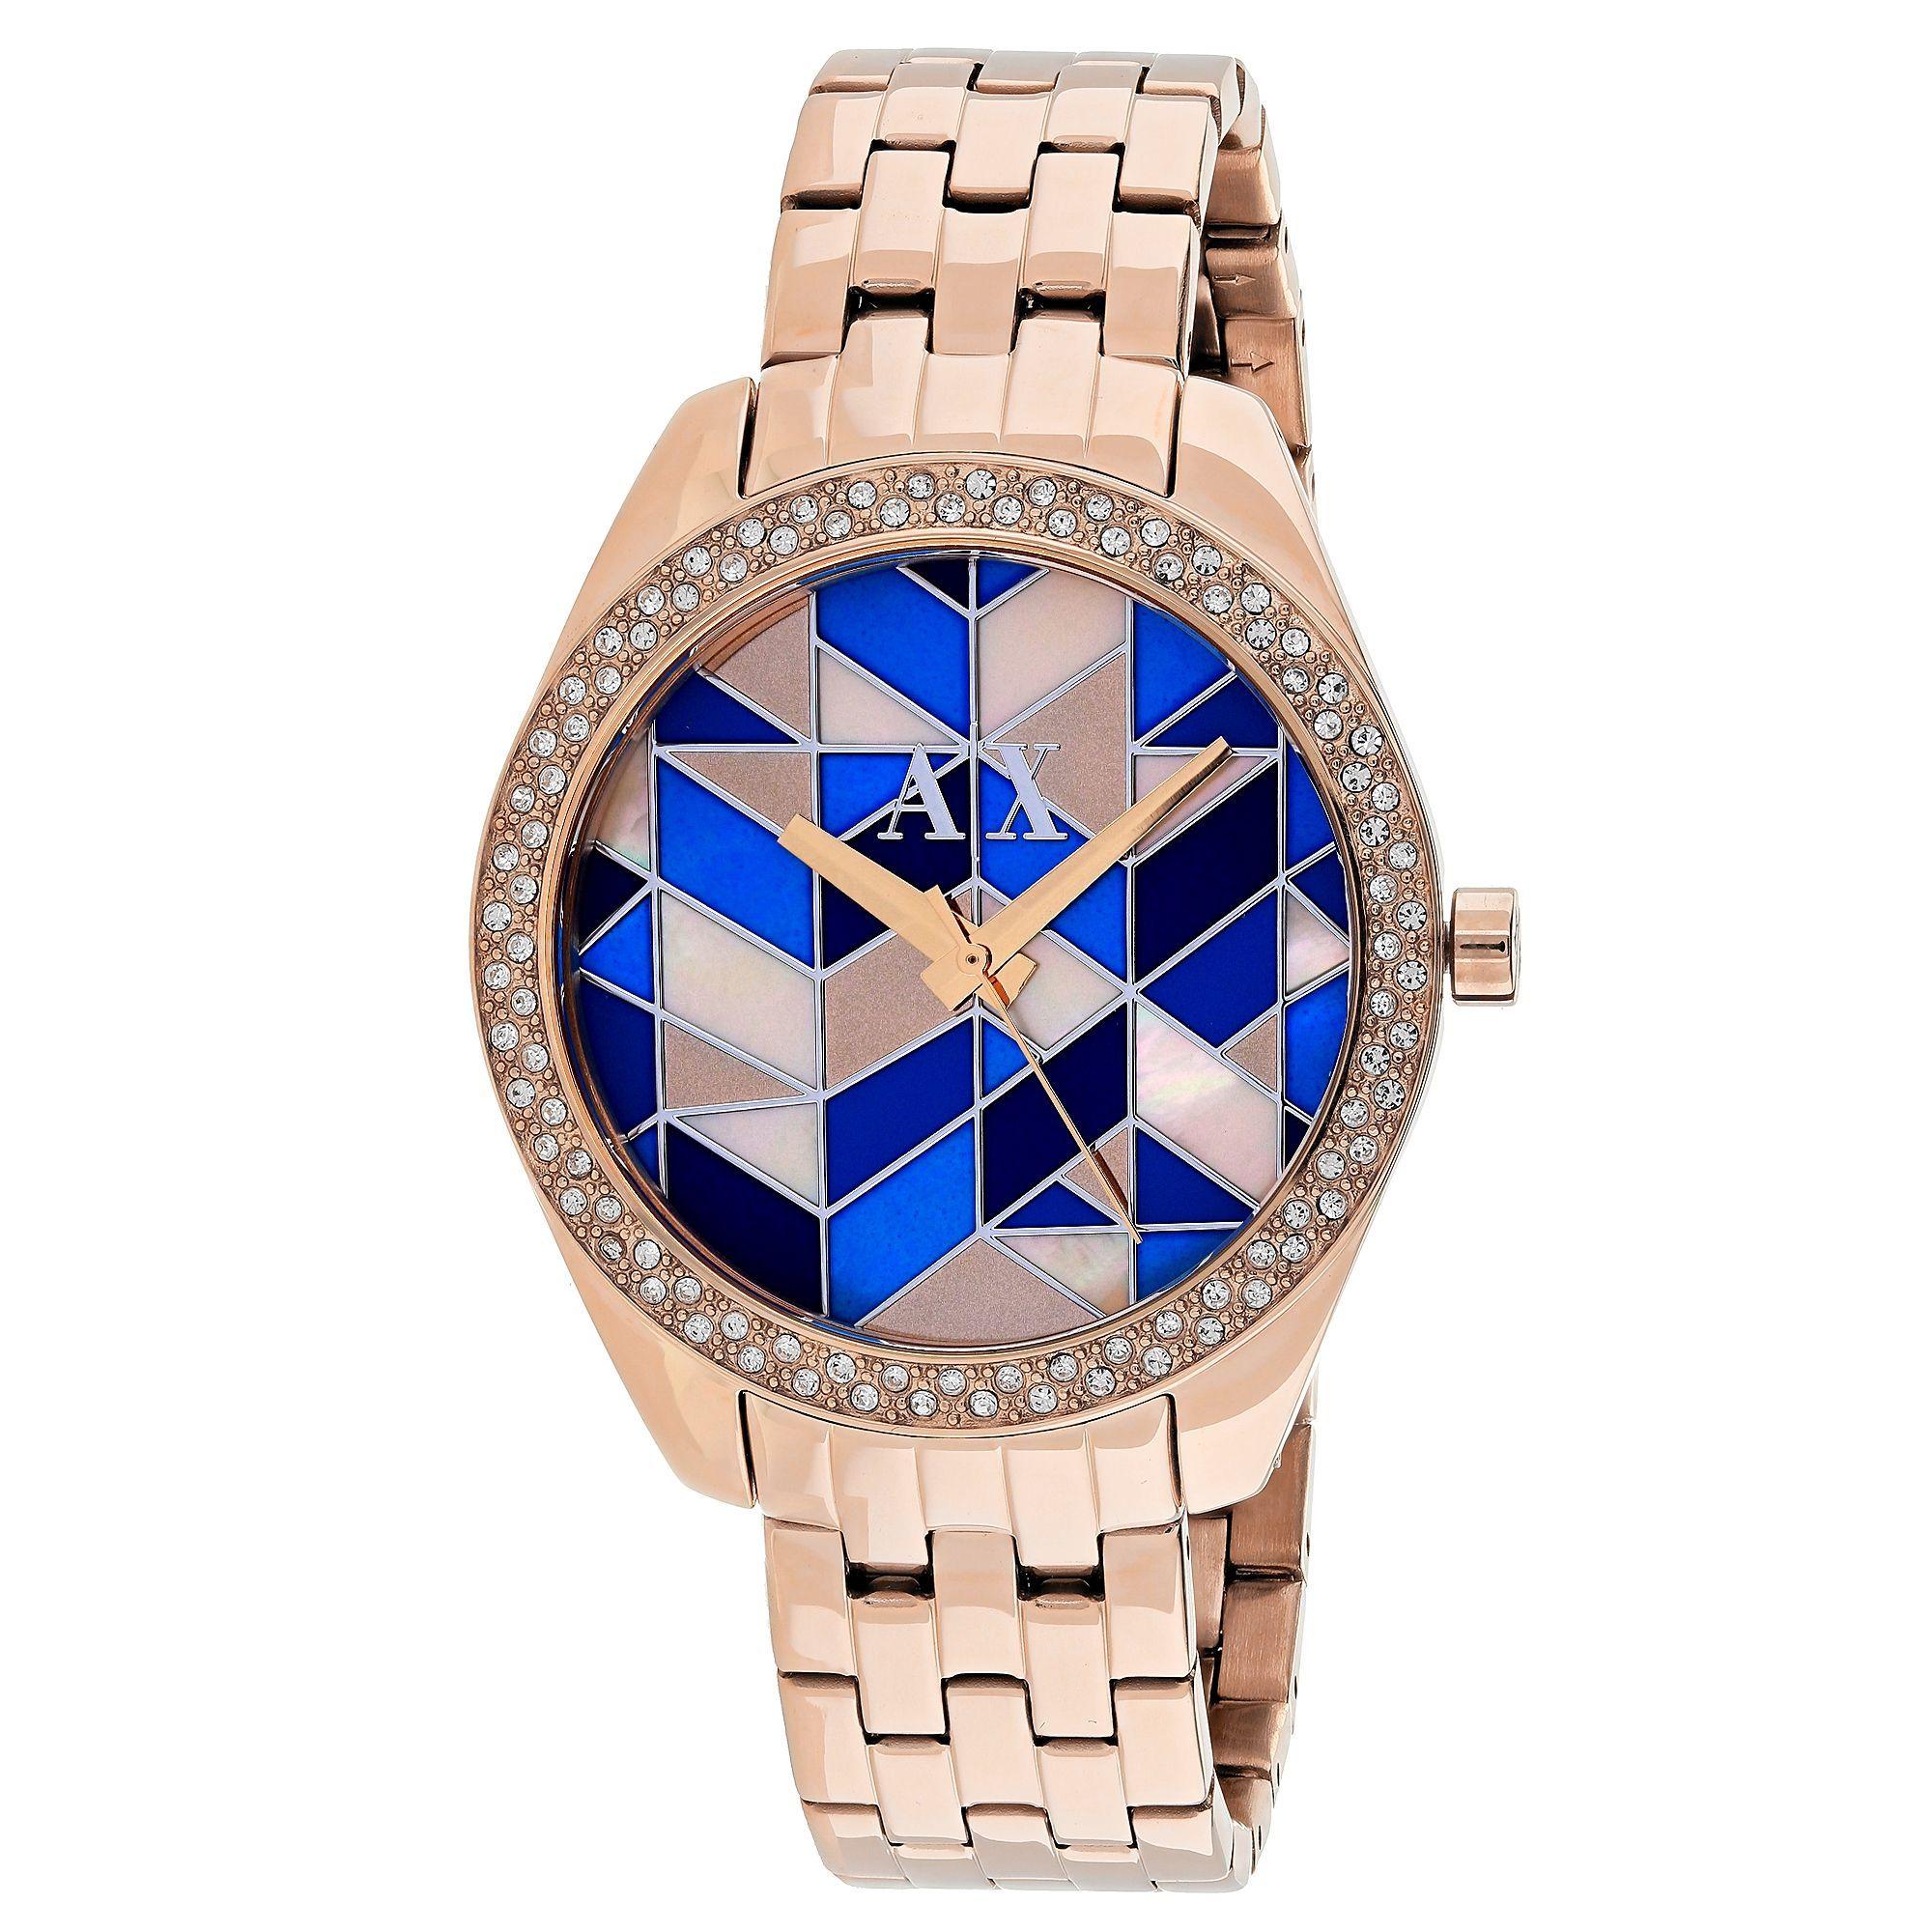 b4881687912 Armani Exchange Women s AX5528 Serena Round Silver Bracelet Watch Relógios  Femininos